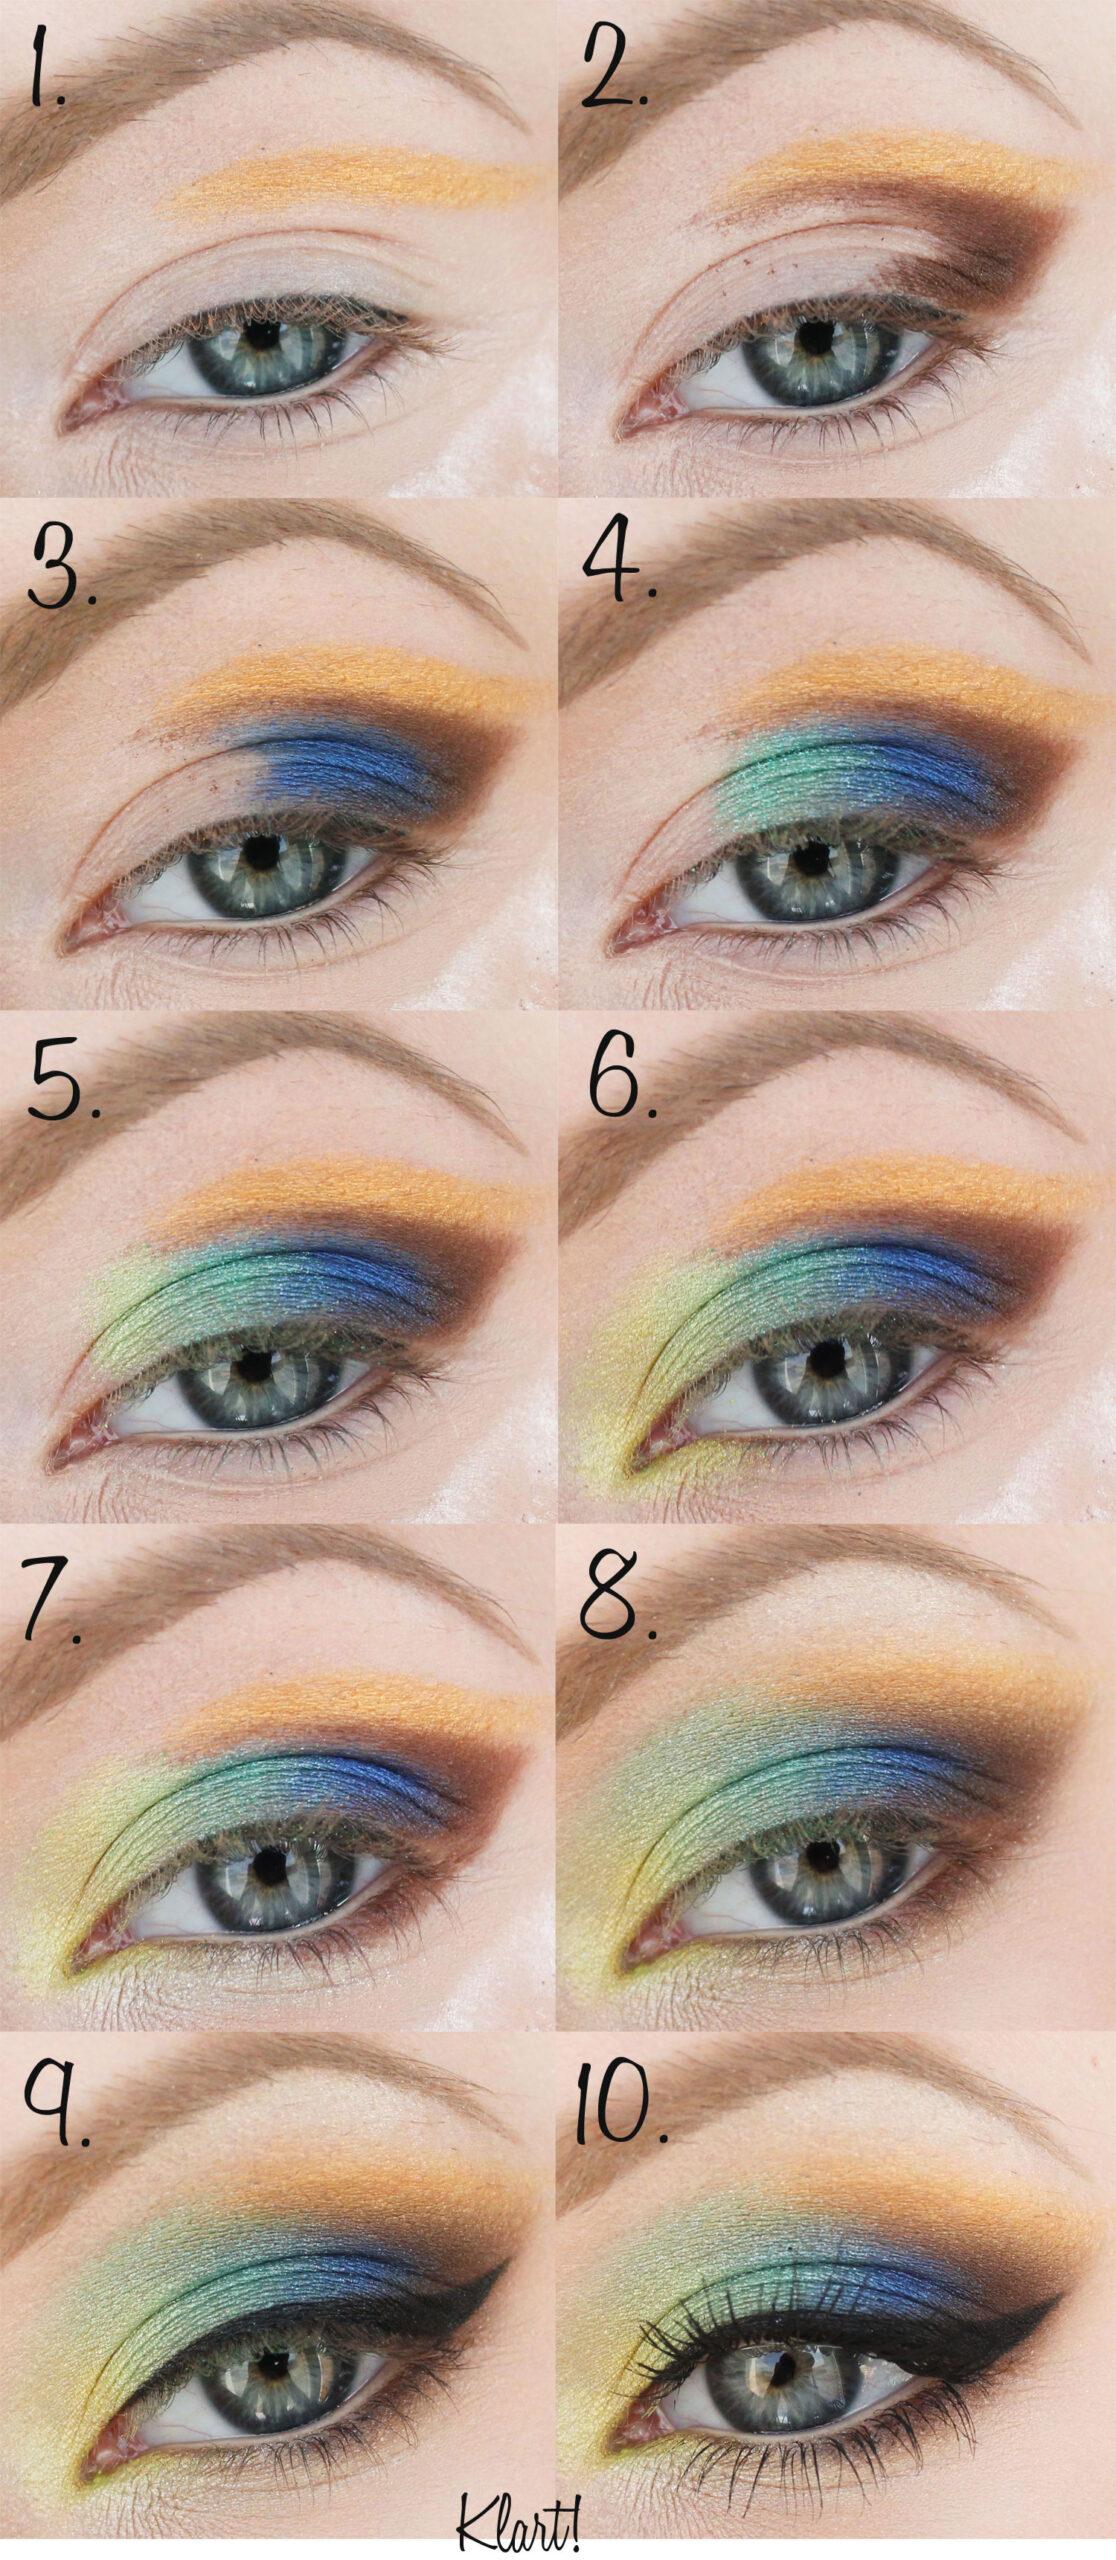 maquillaje colorido de verano